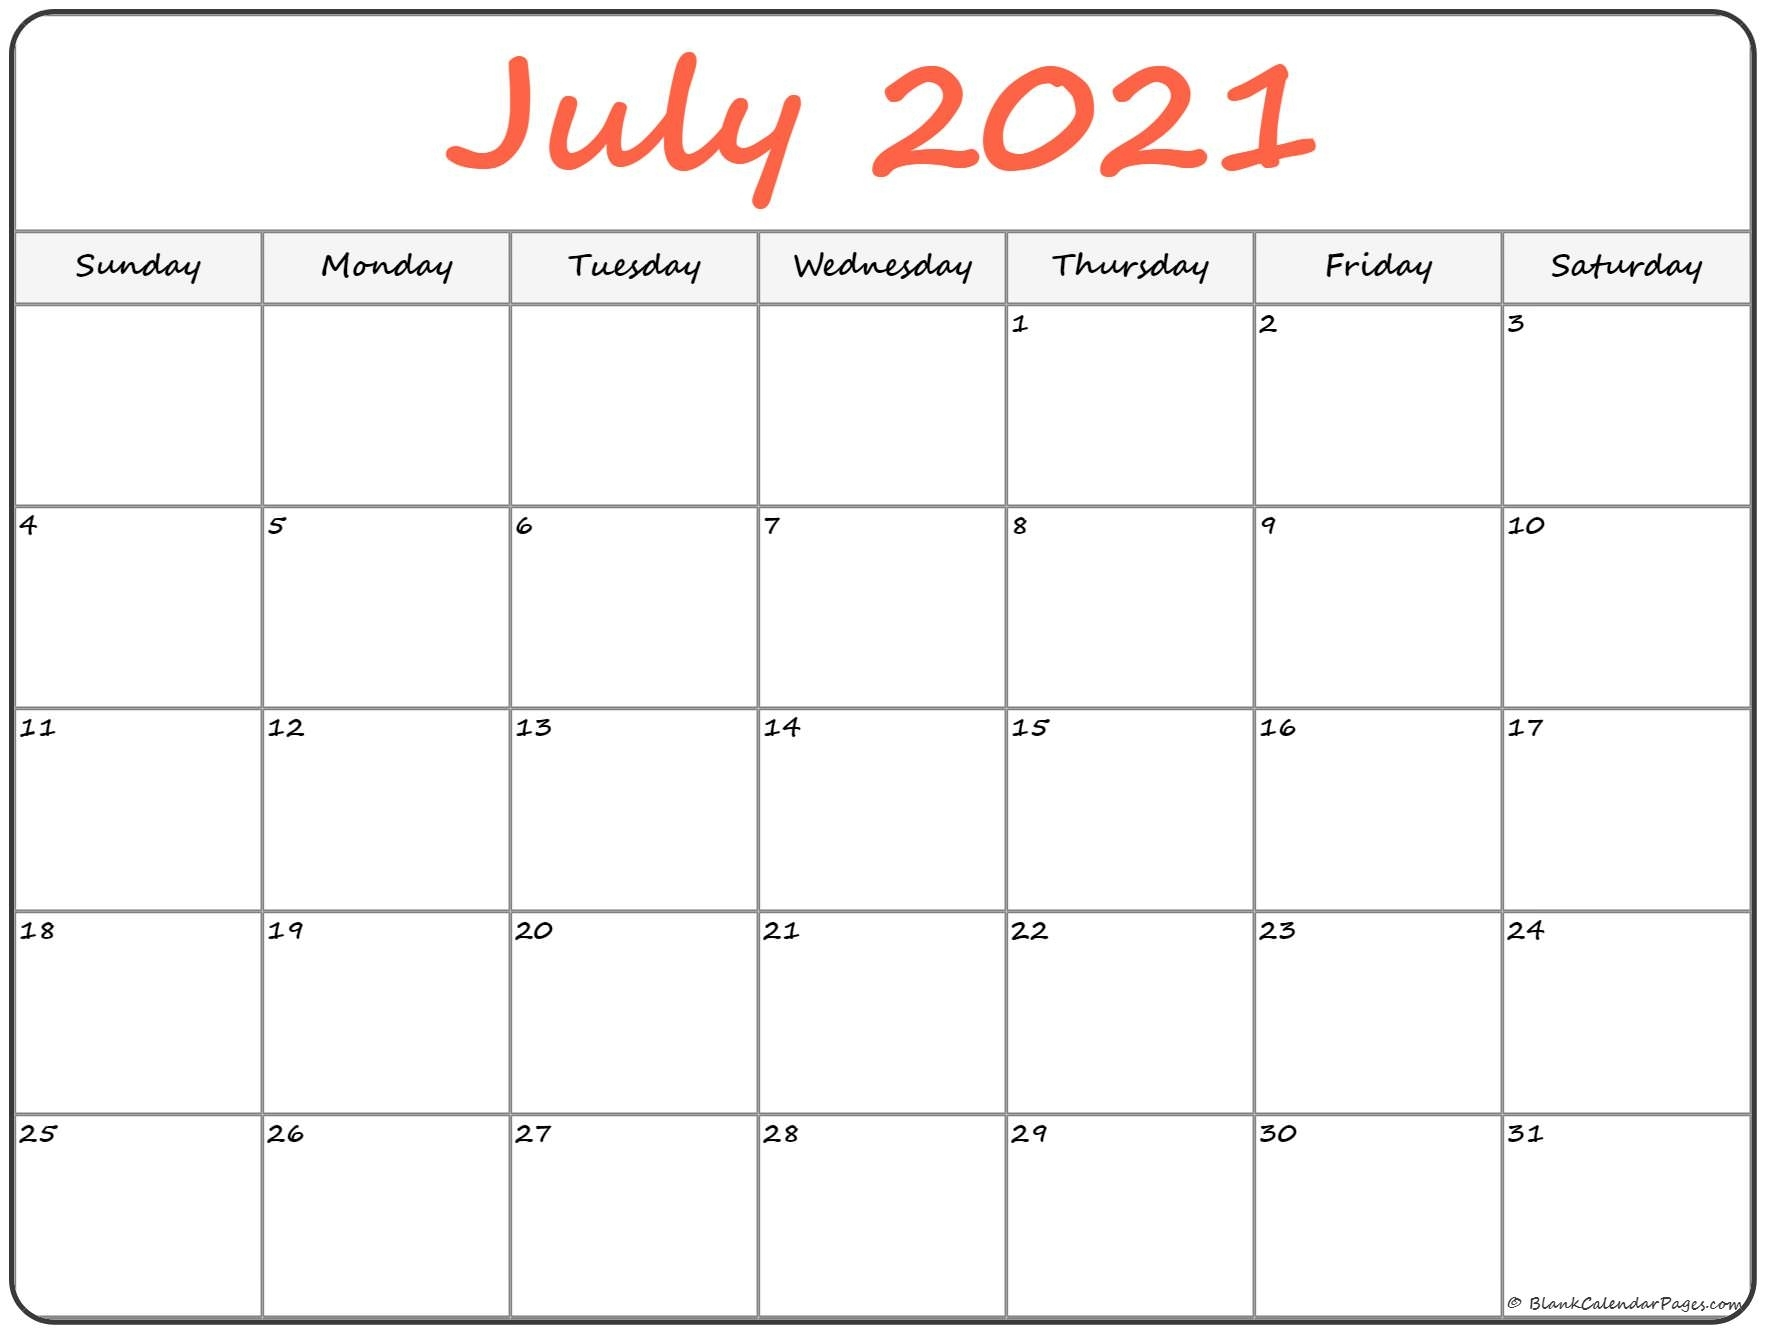 July 2021 Calendar | Free Printable Calendar Printable July And August 2021 Calendar